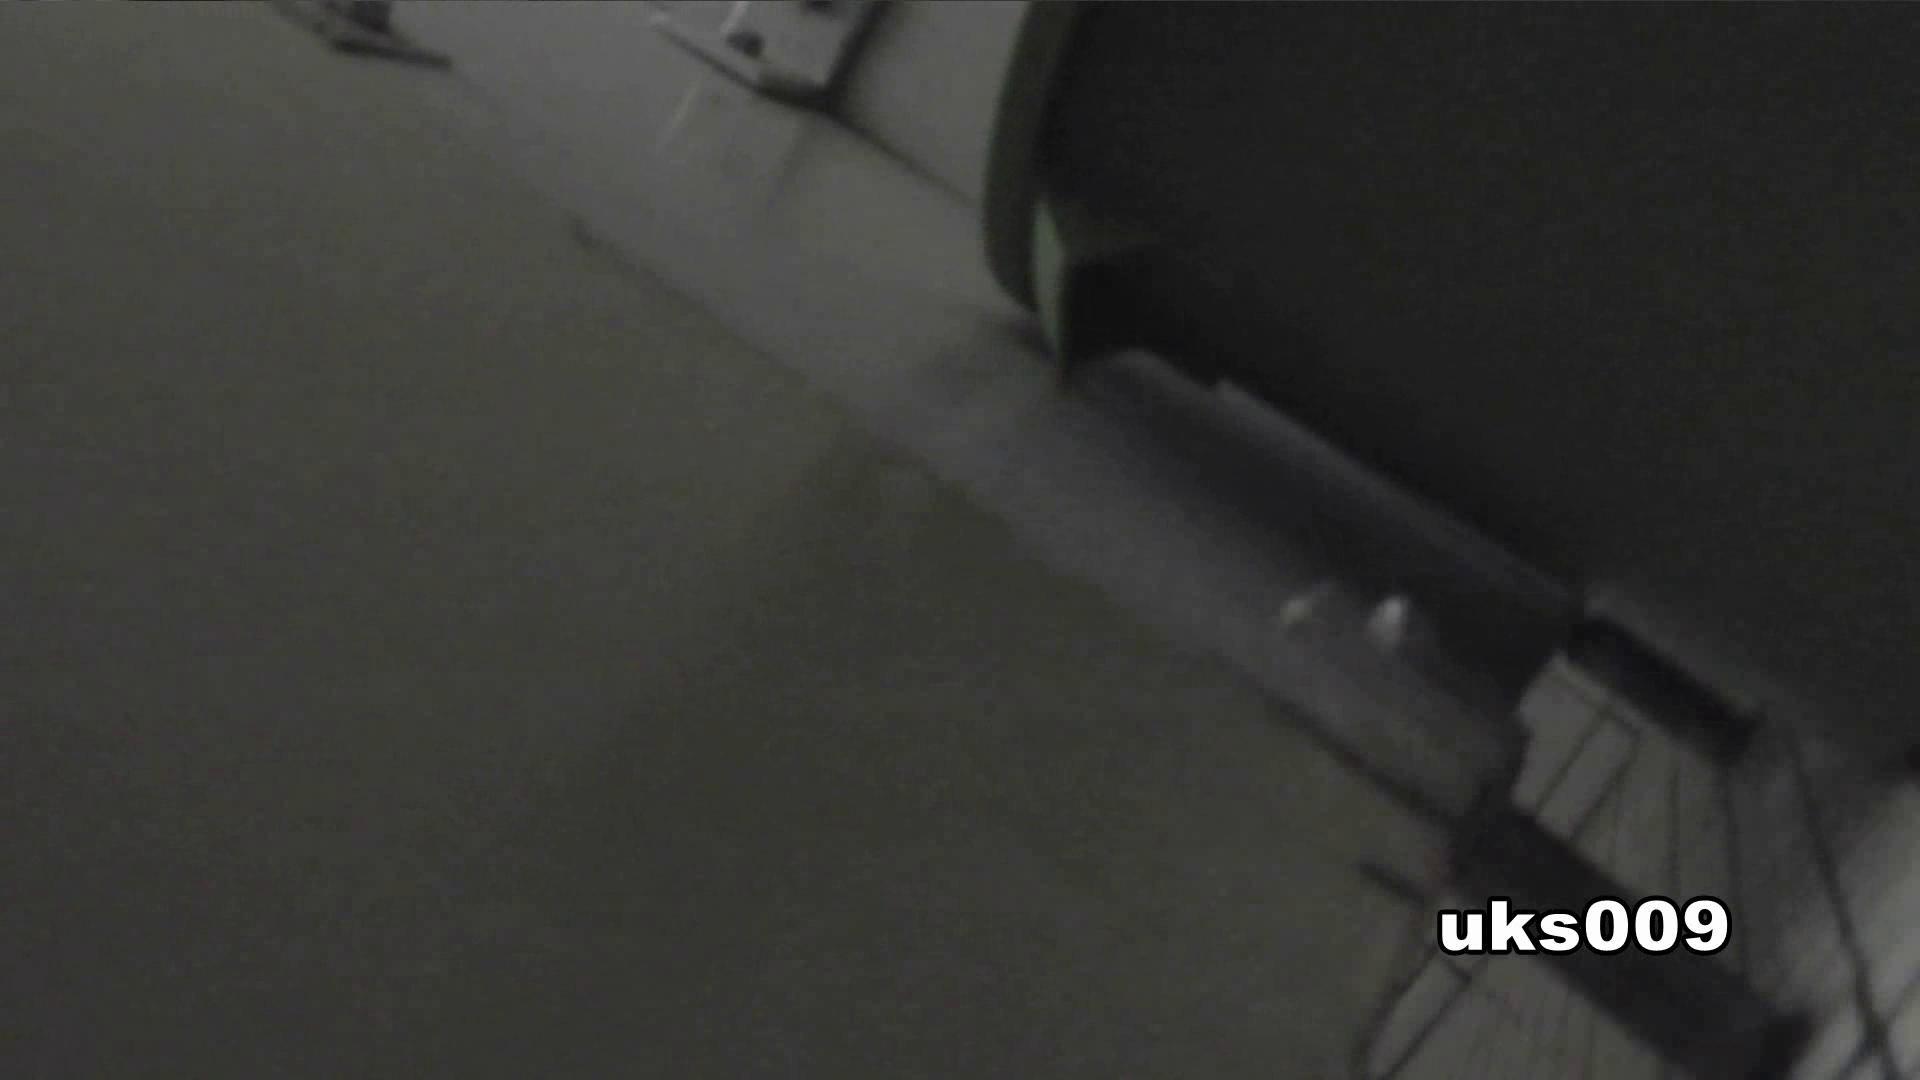 洗面所特攻隊 vol.009 丸見え セックス無修正動画無料 82枚 54